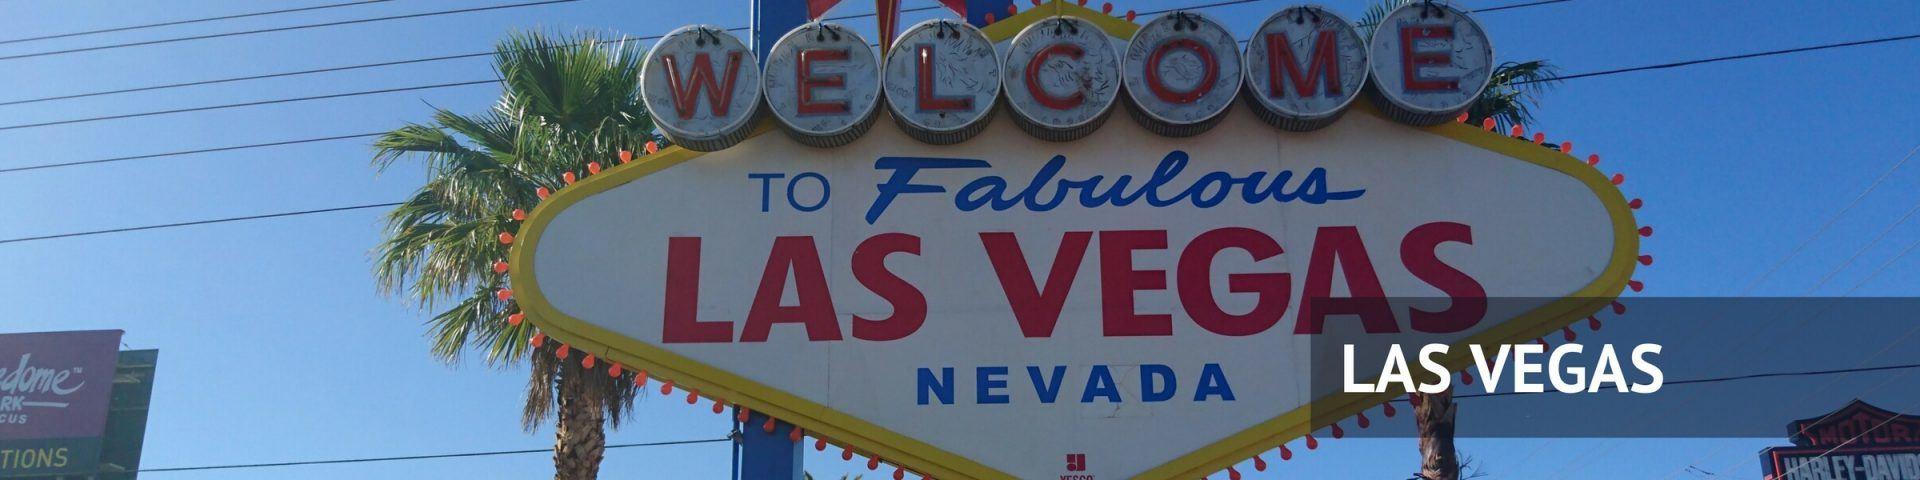 Las Vegas Header